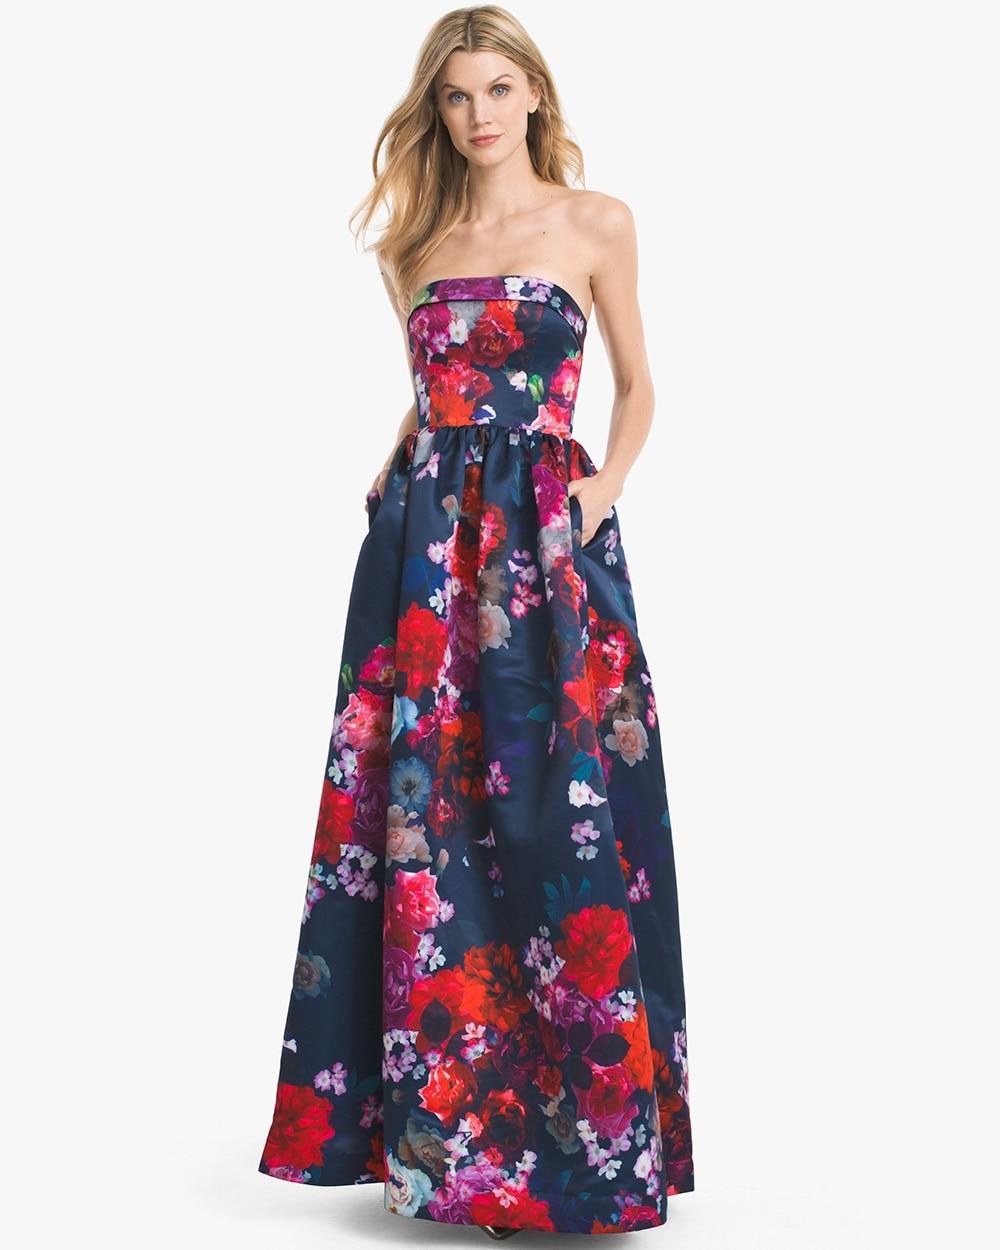 Jamie Sleeveless Floral Jacquard Gown - White House Black Market